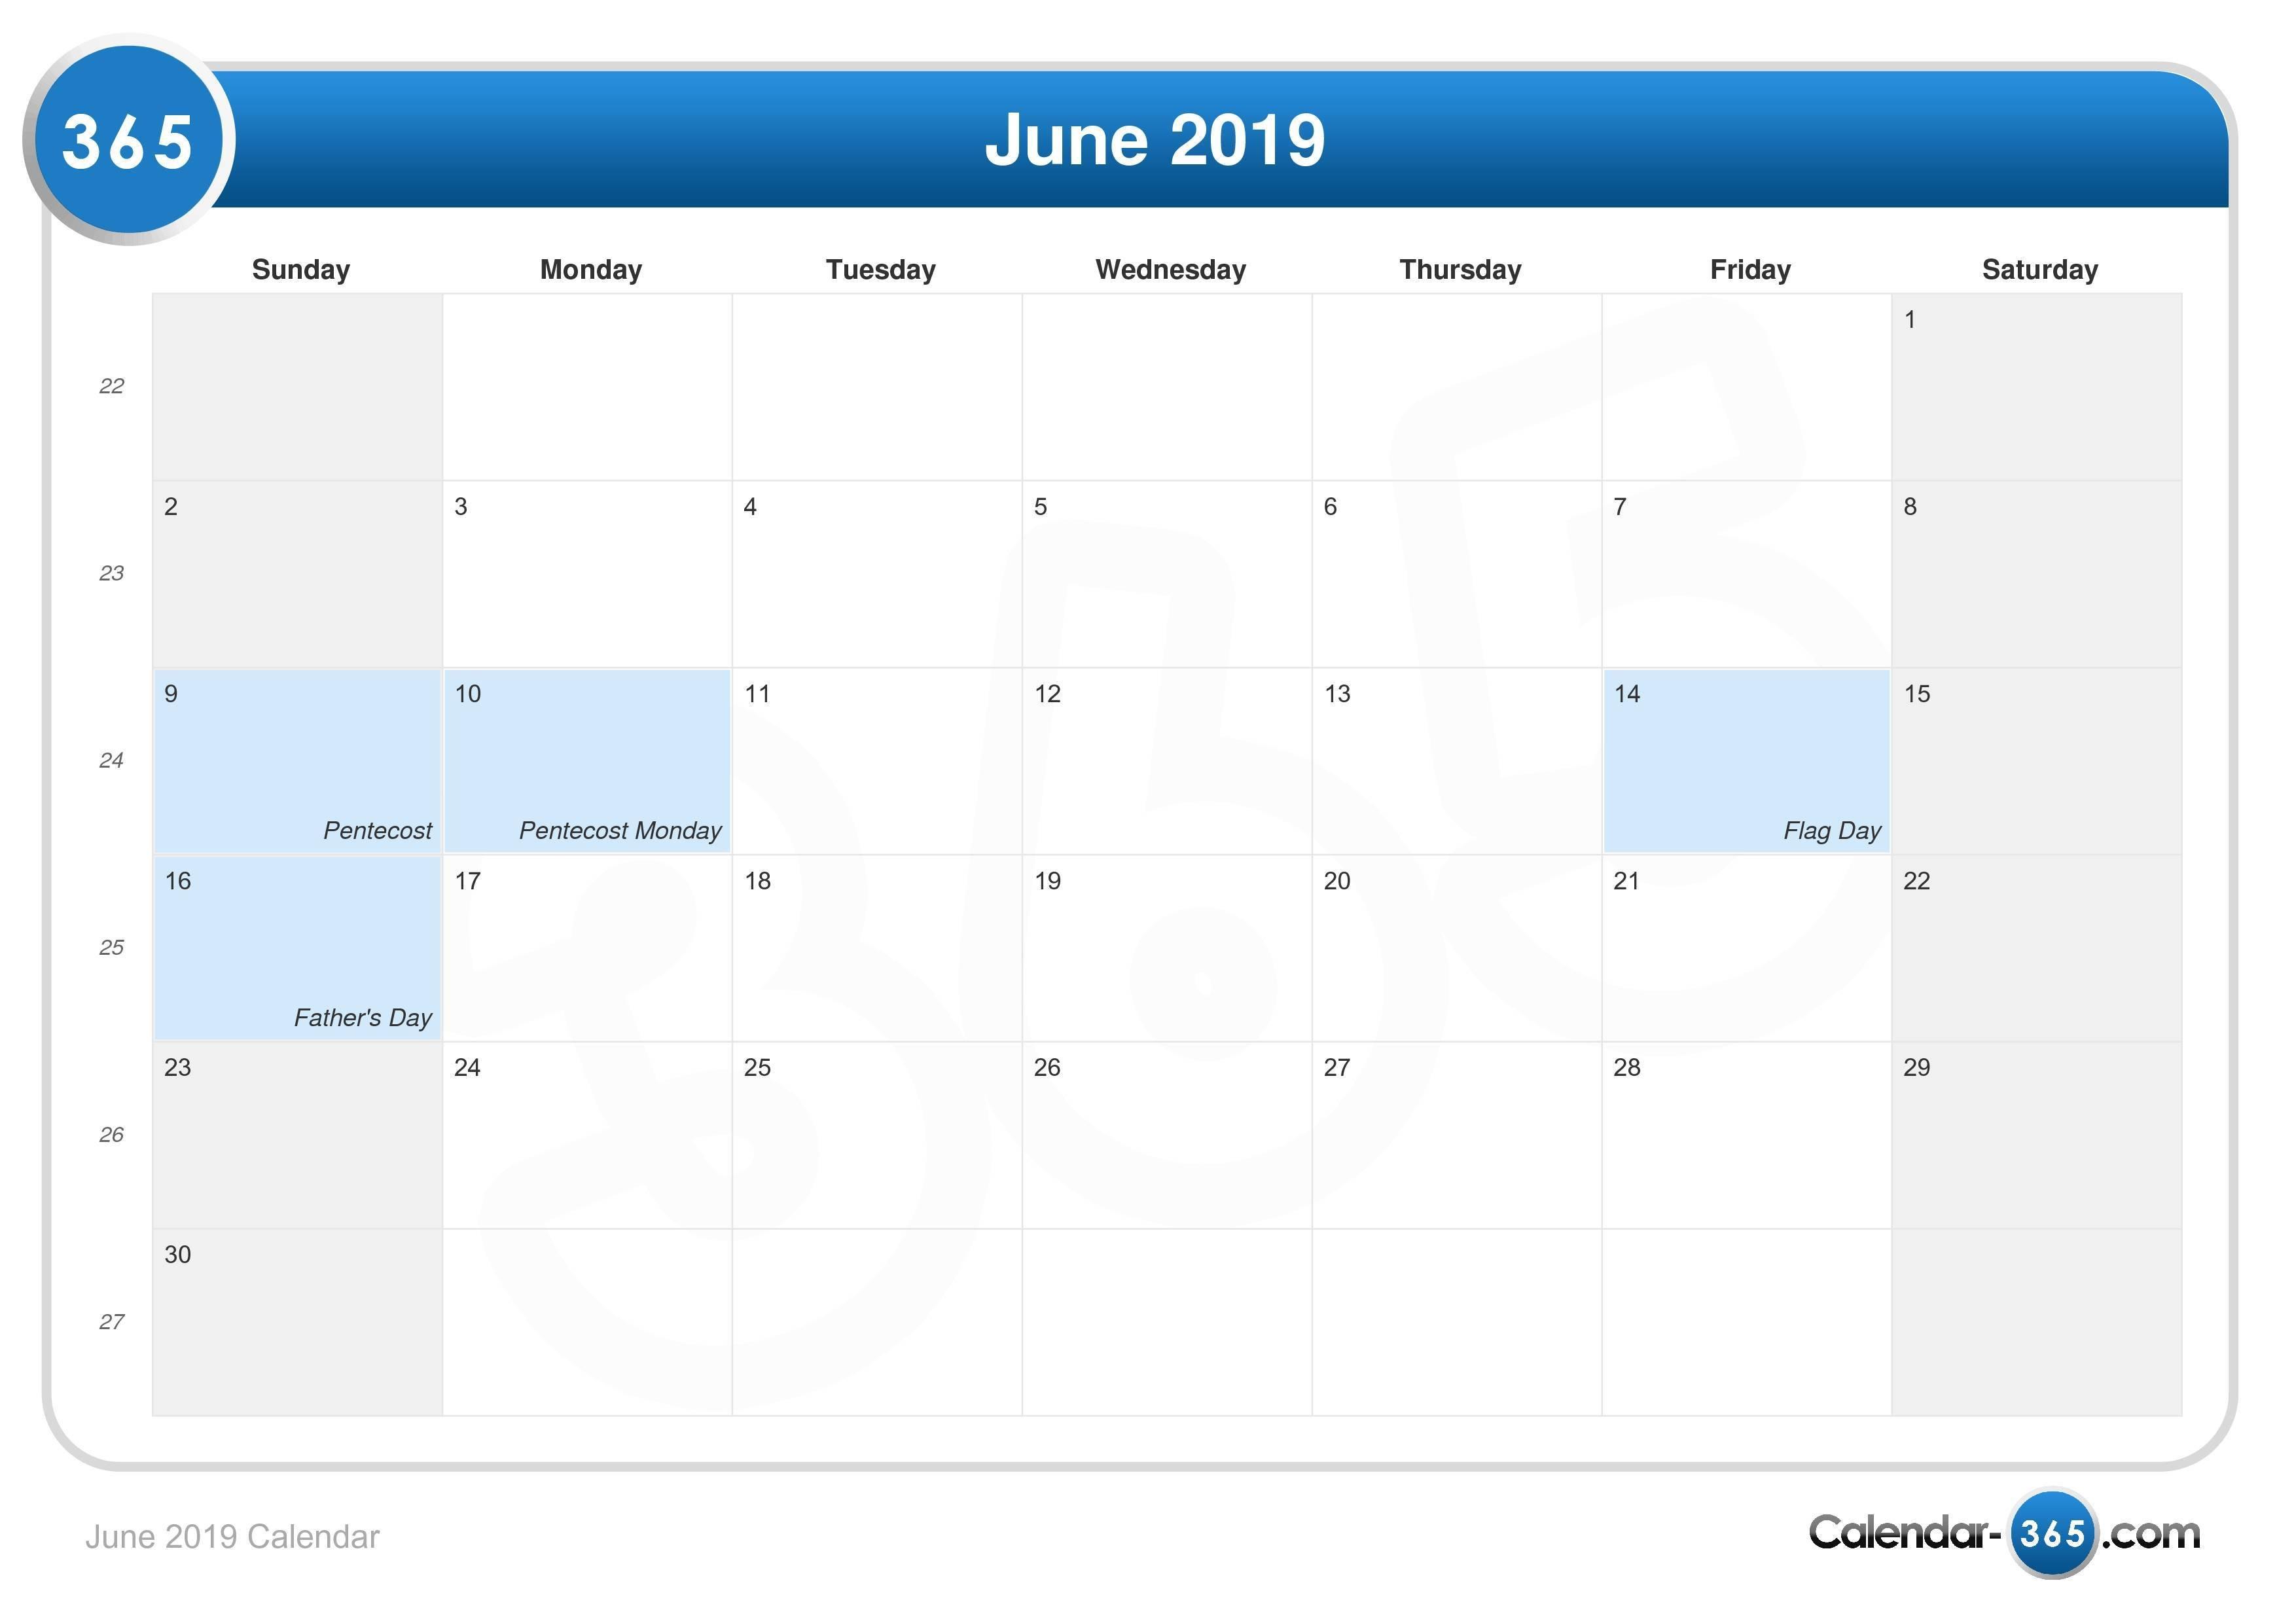 June 2019 Calendar June 4 2019 Calendar